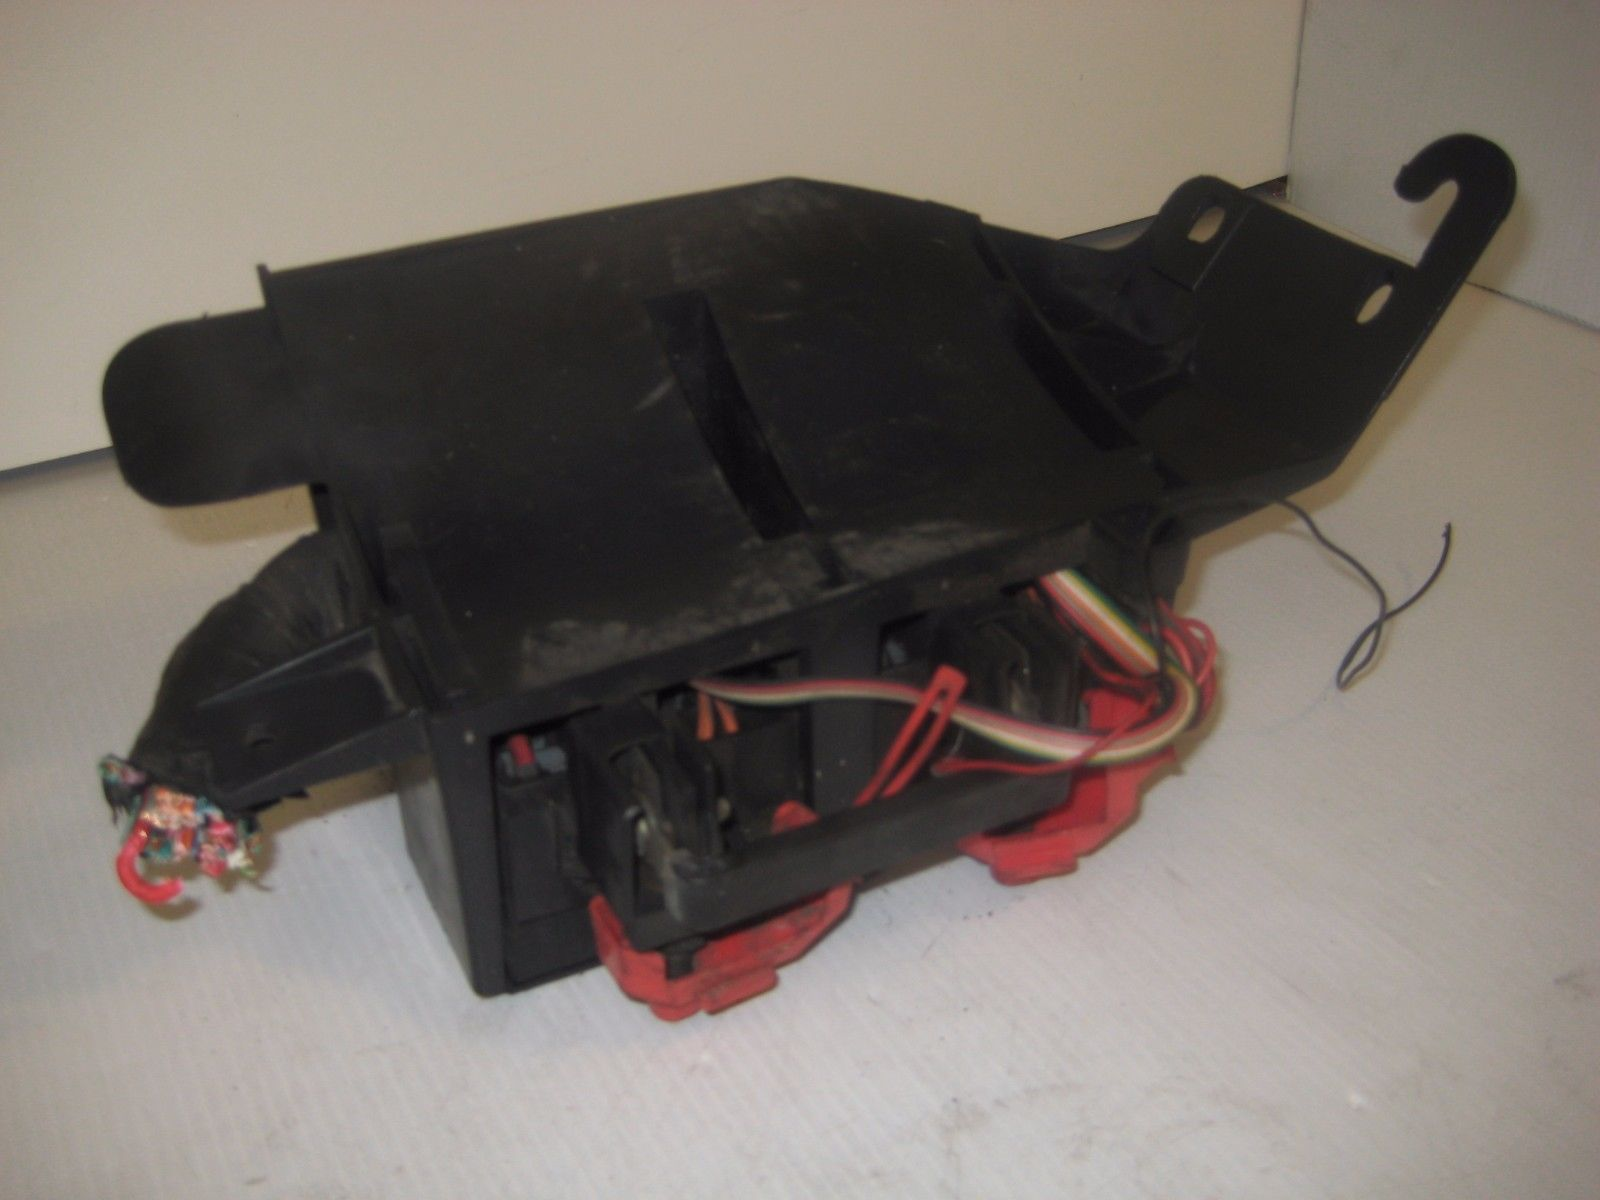 CHEVROLET IMPALA 03 04 05  Fuse Box Engine Relay Component OEM image 4